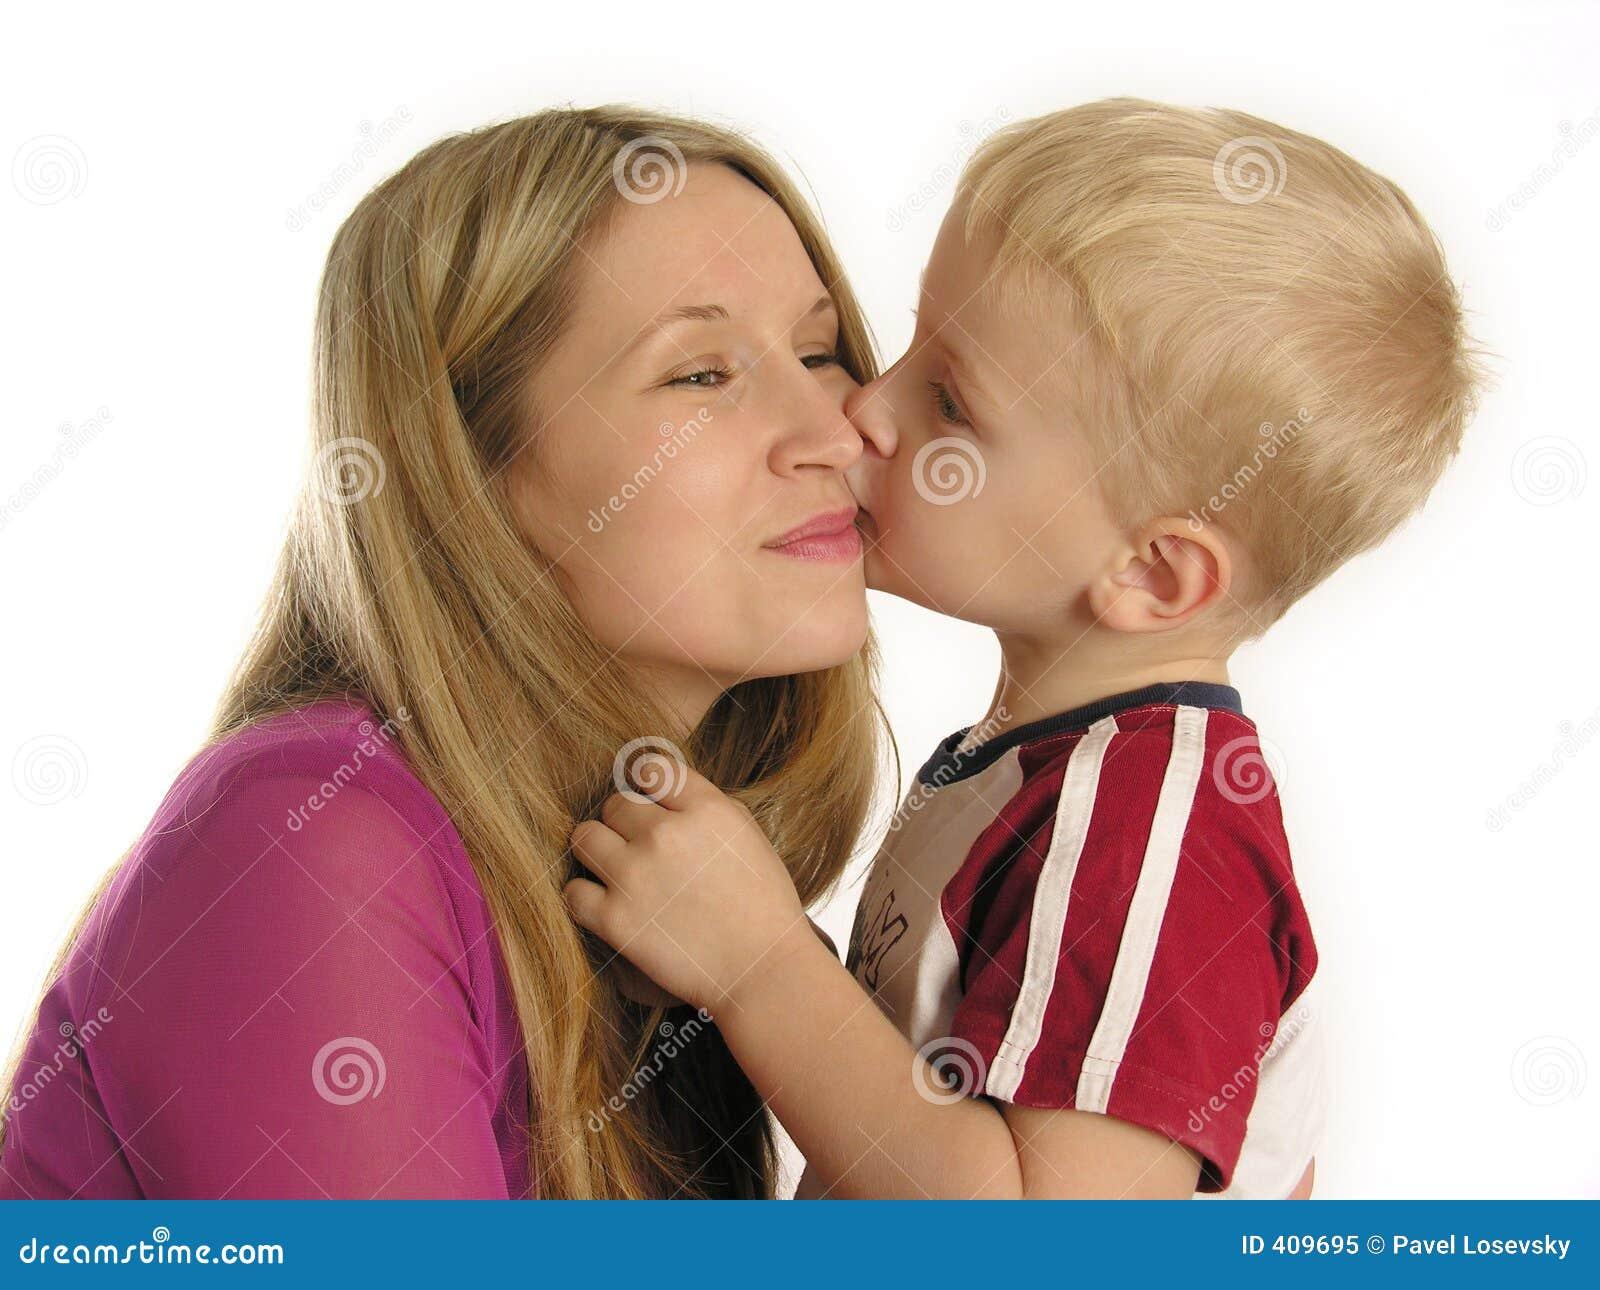 Син и мама сех 8 фотография